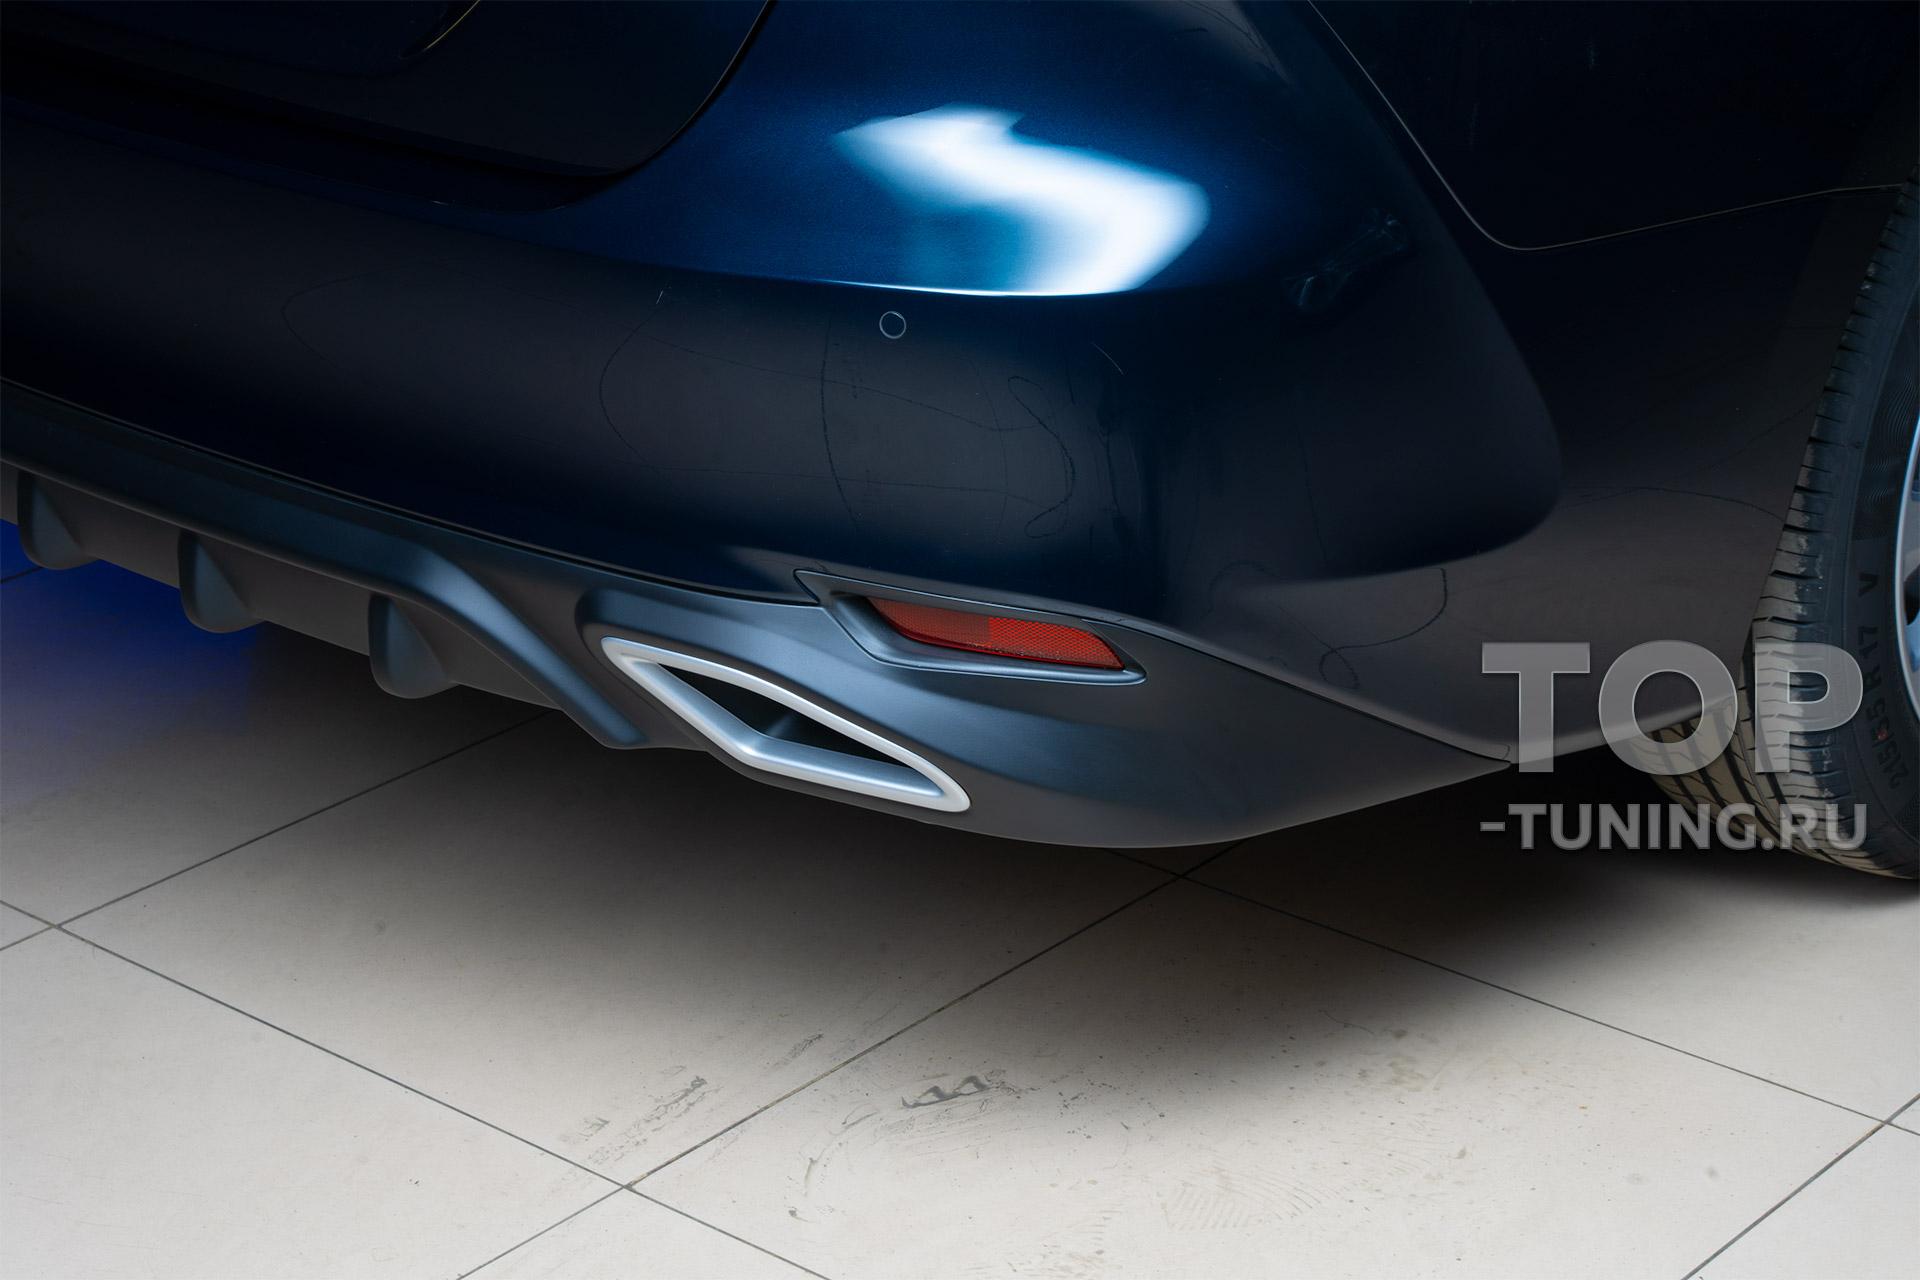 Накладка на задний бампер с имитацией выхлопа - обвес Consul Sport - Тюнинг Тойота Камри 70